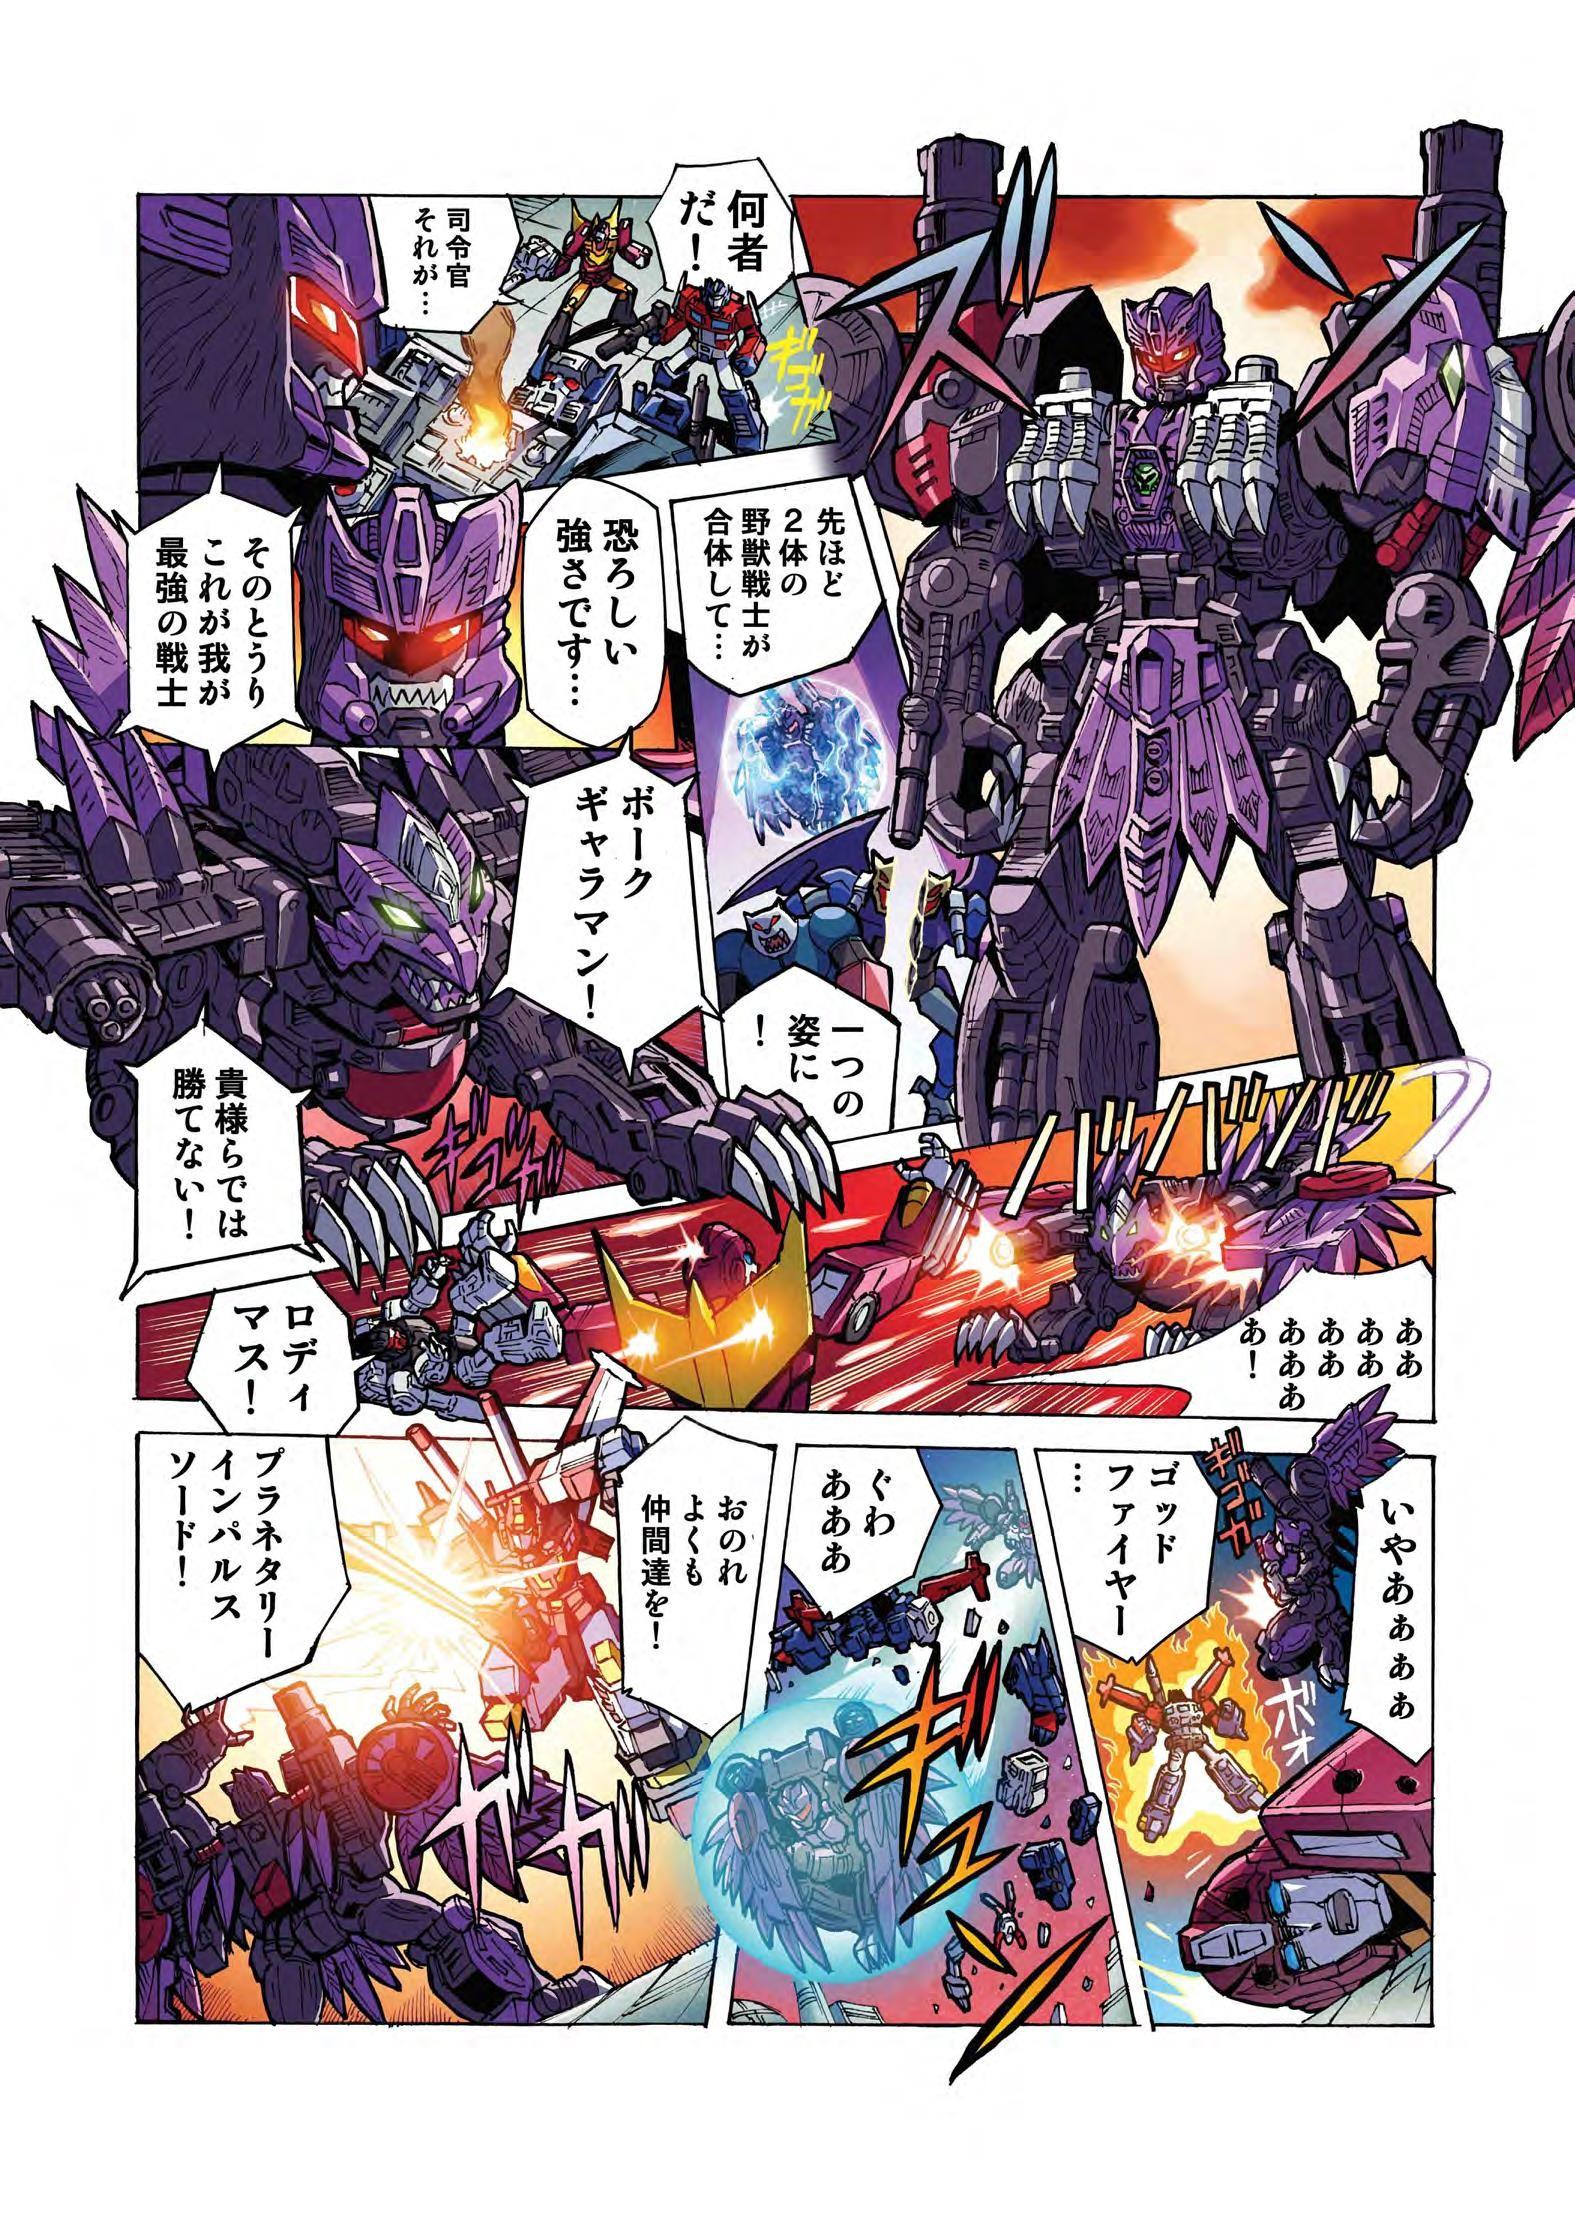 Transformers News: New Takara Legends LG-EX Big Powered Manga Scans